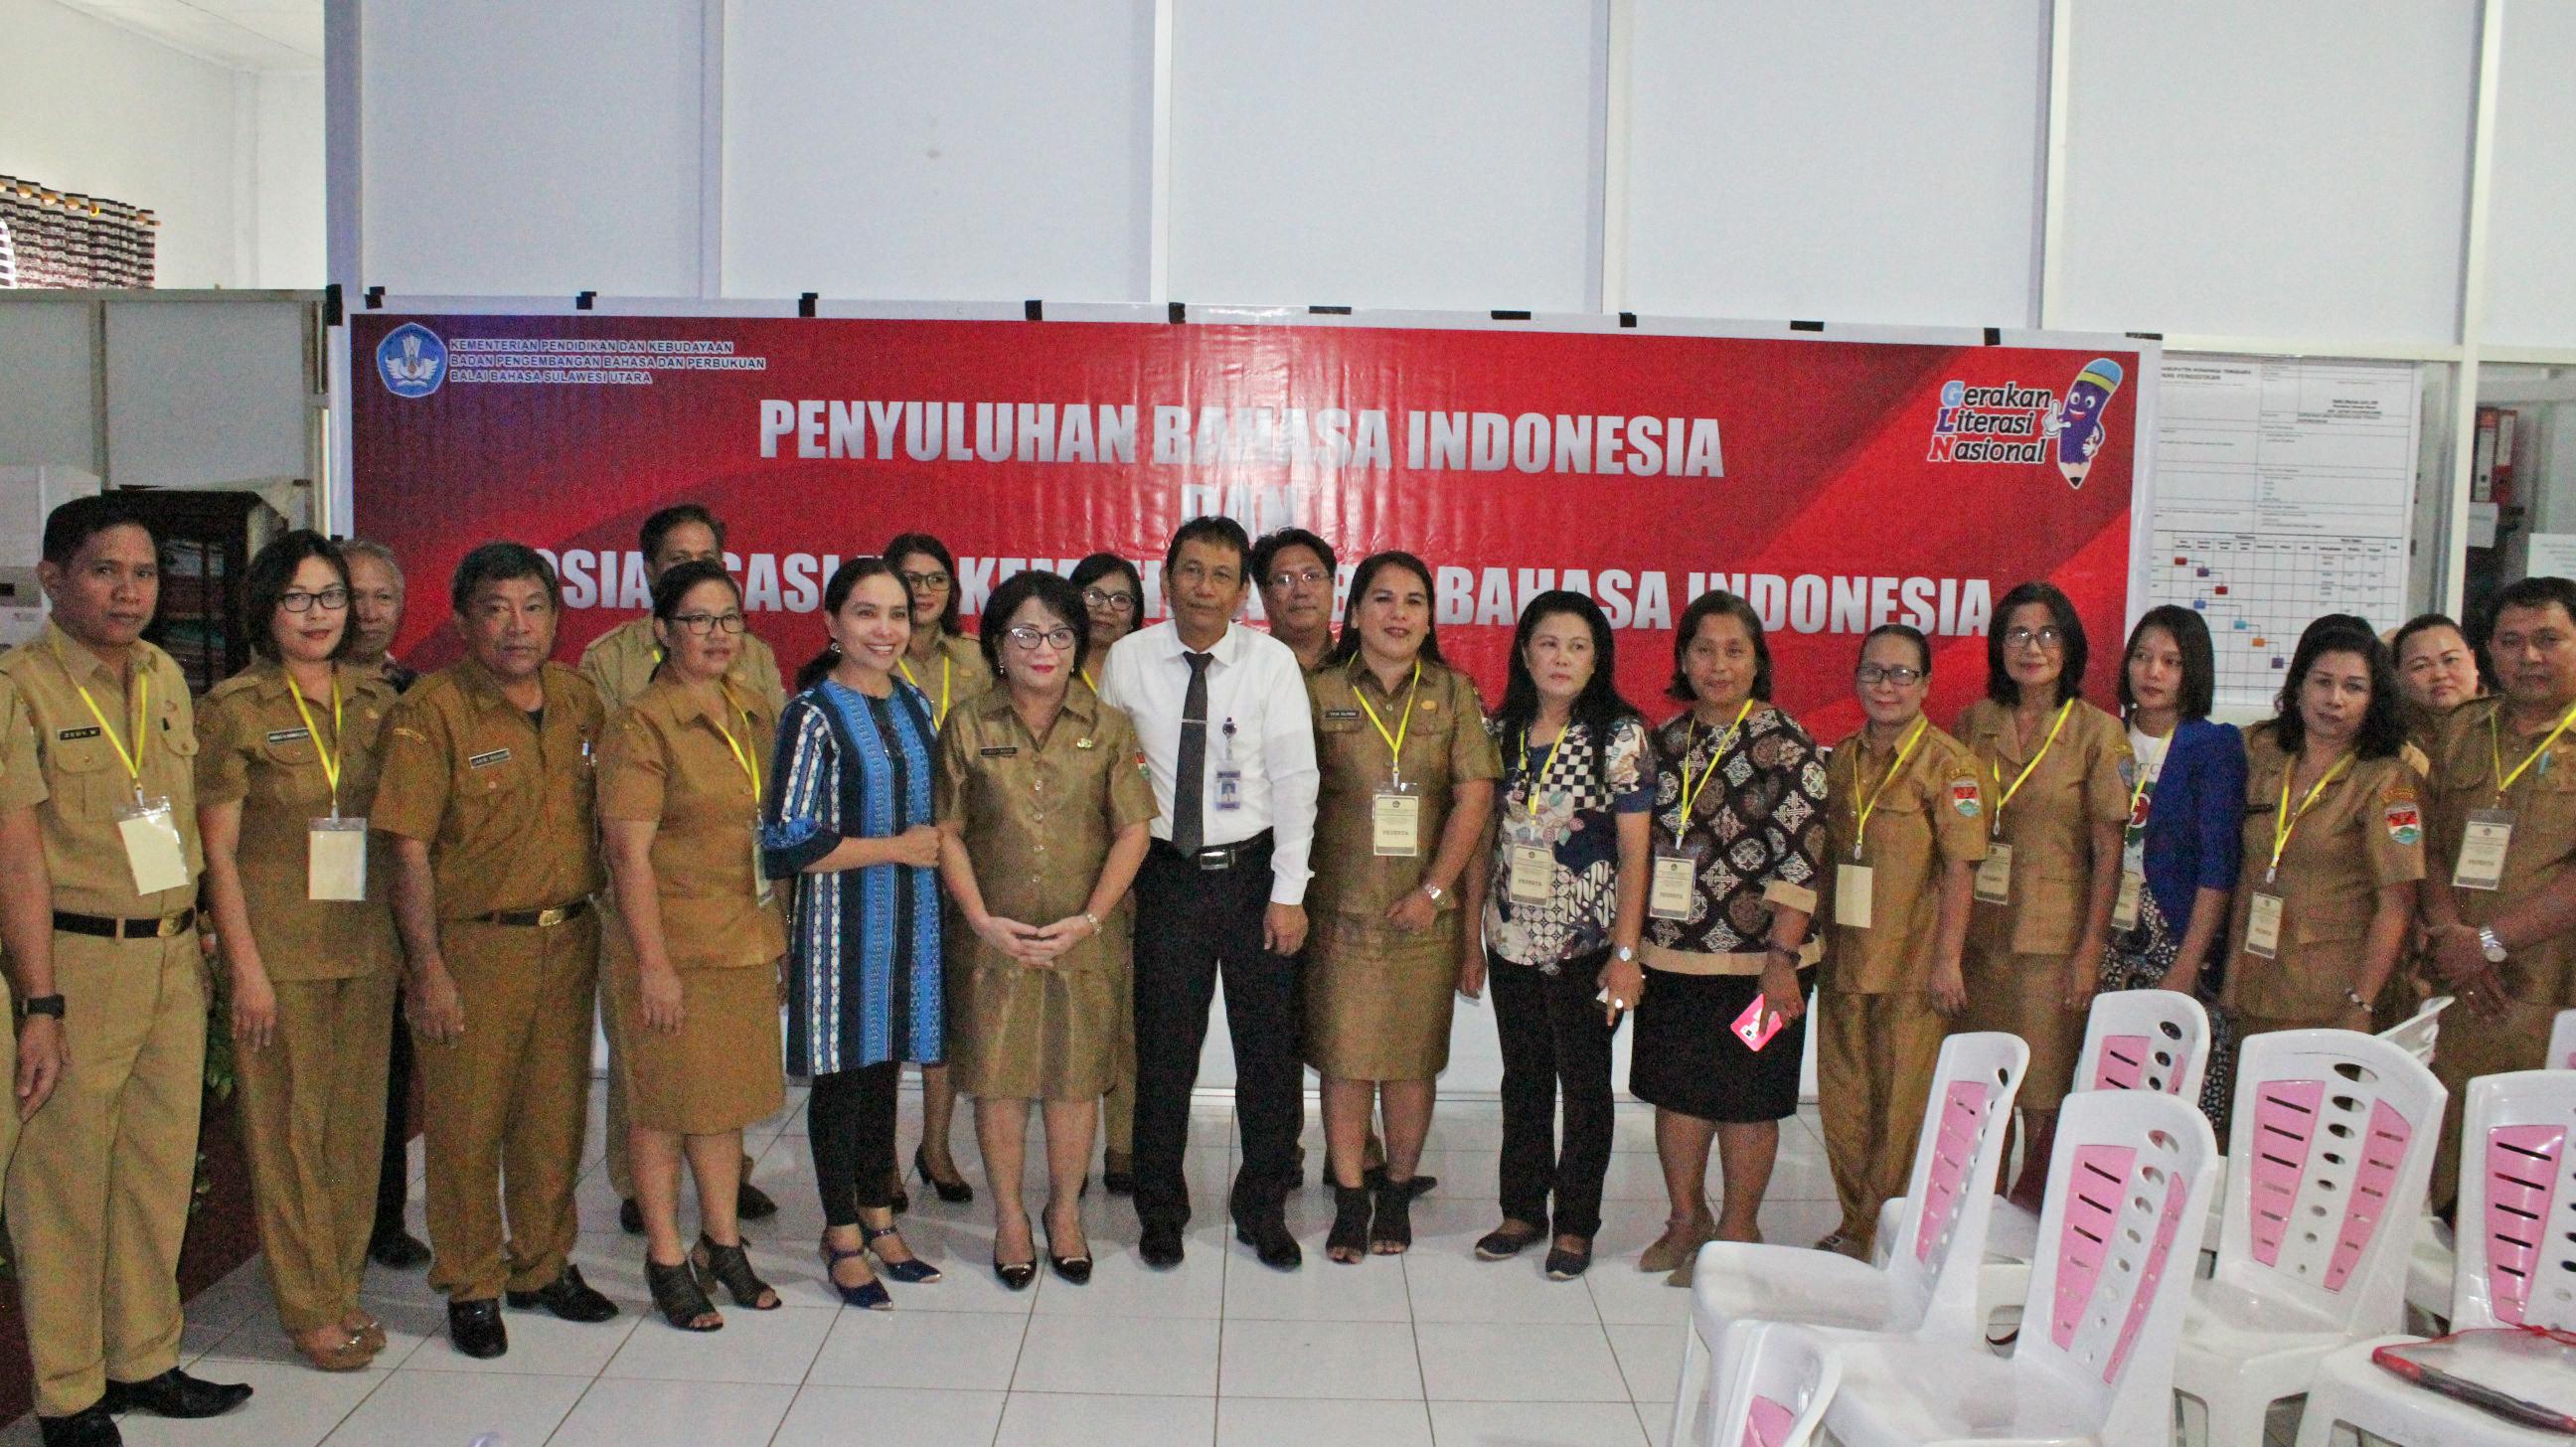 Penyuluhan Bahasa Indonesia dan Sosialisasi Uji Kemahiran Berbahasa Indonesia di Minahasa Tenggara